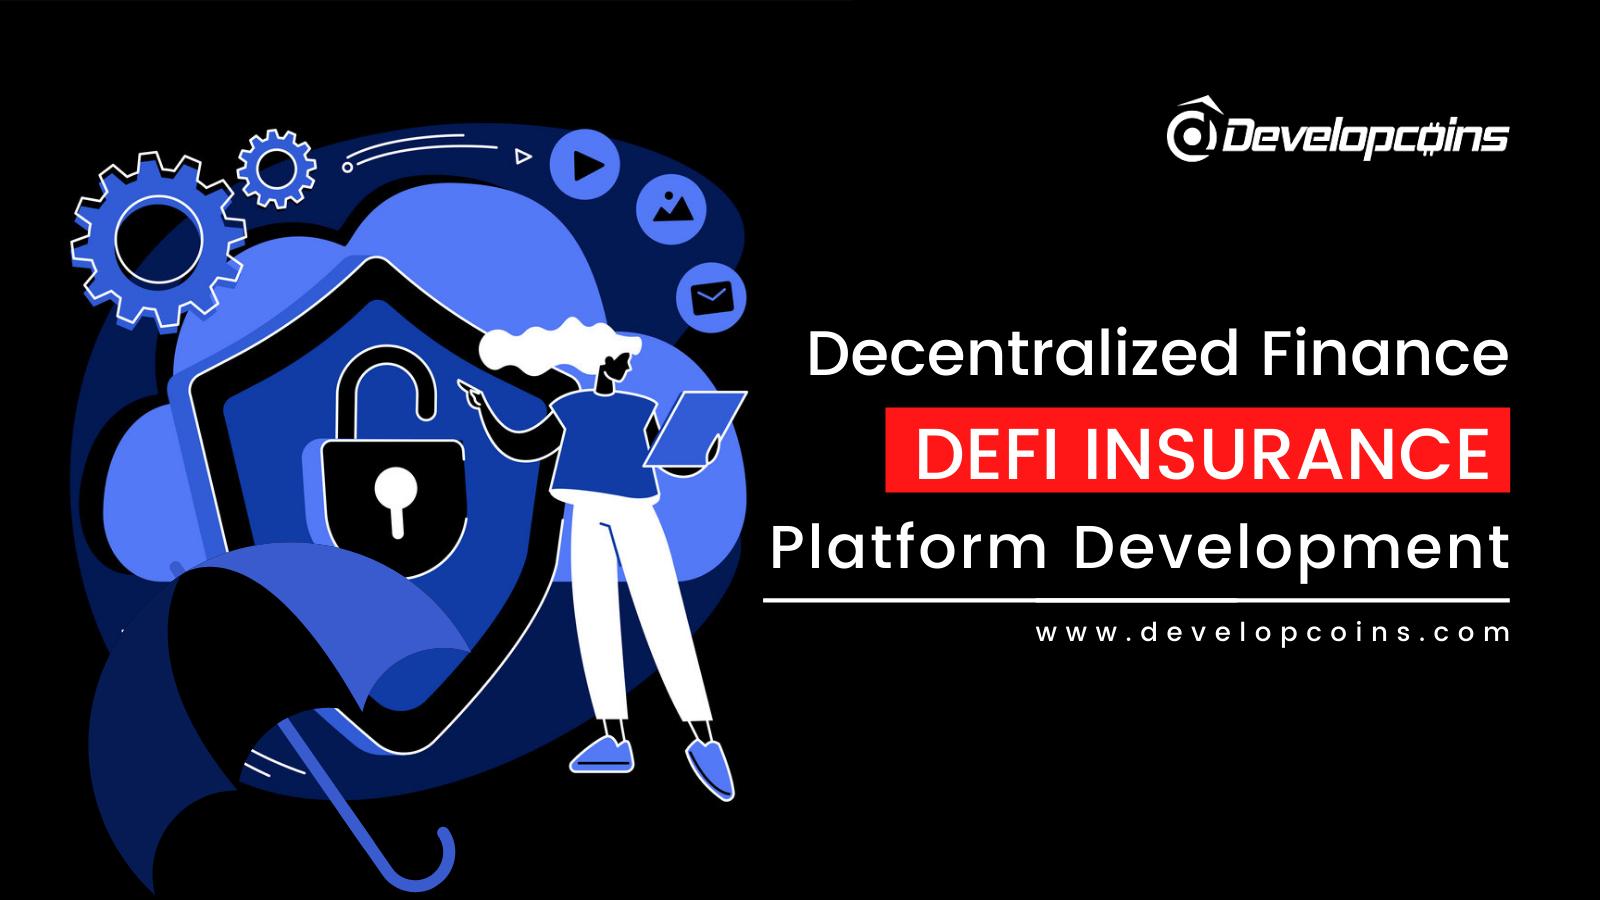 DeFi Insurance Platform Development - A promising sector for Decentralized Ecosystem